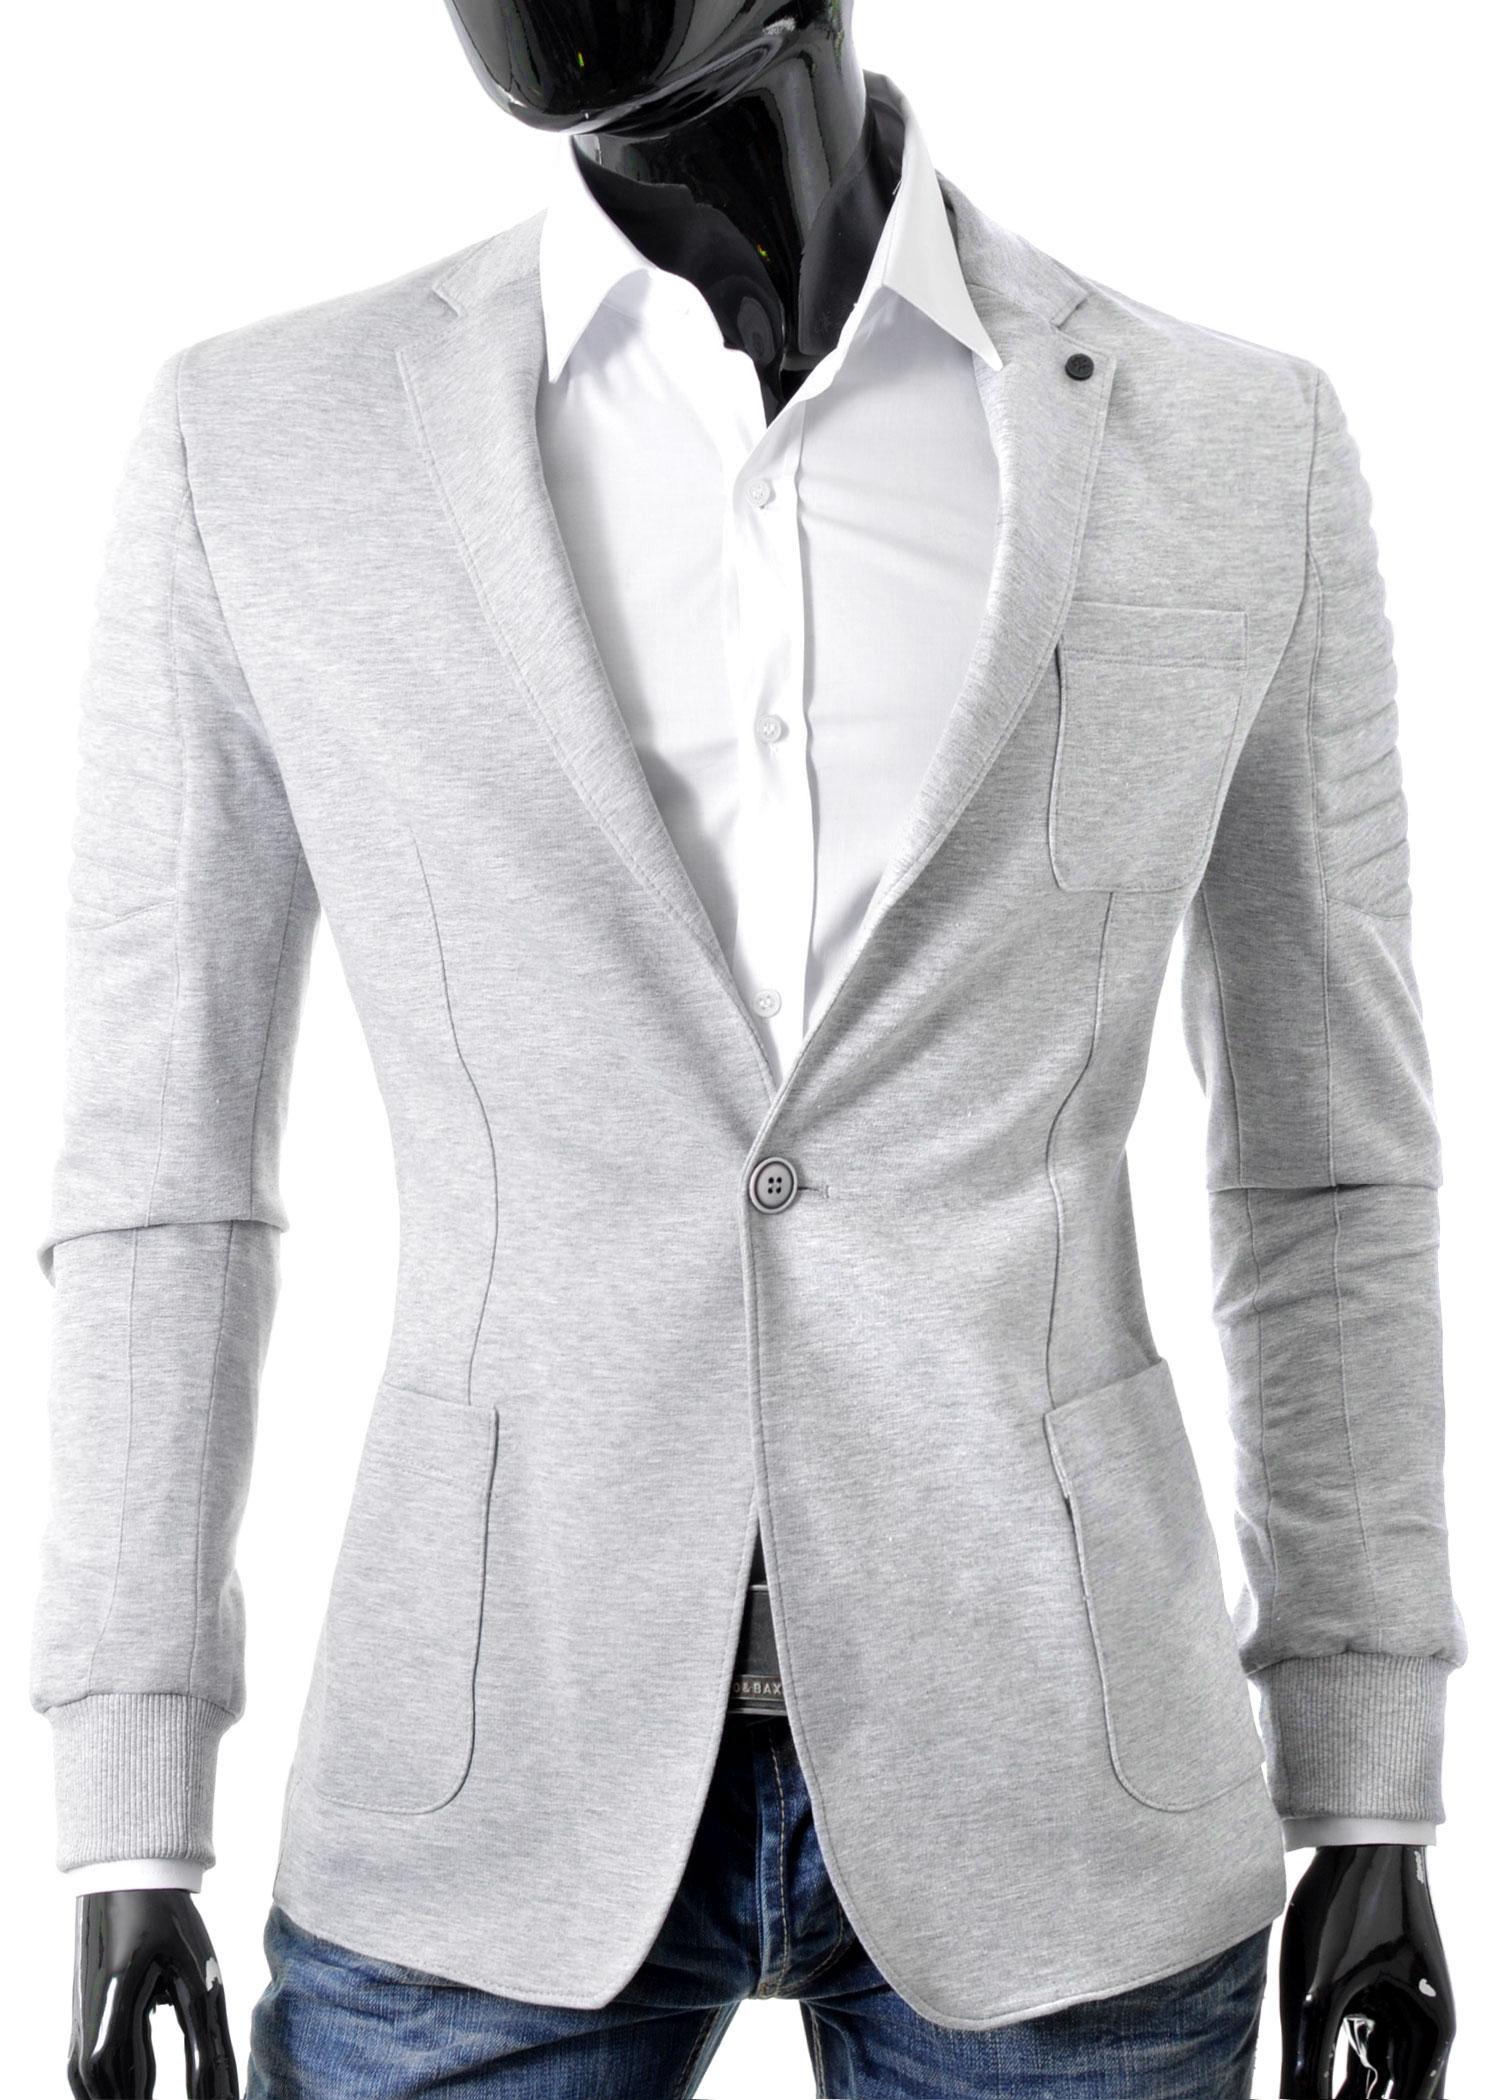 Men SOUTHPOLE Black Grey BIG /& TALL long sleeve thermal T-shirt 9007-1301S